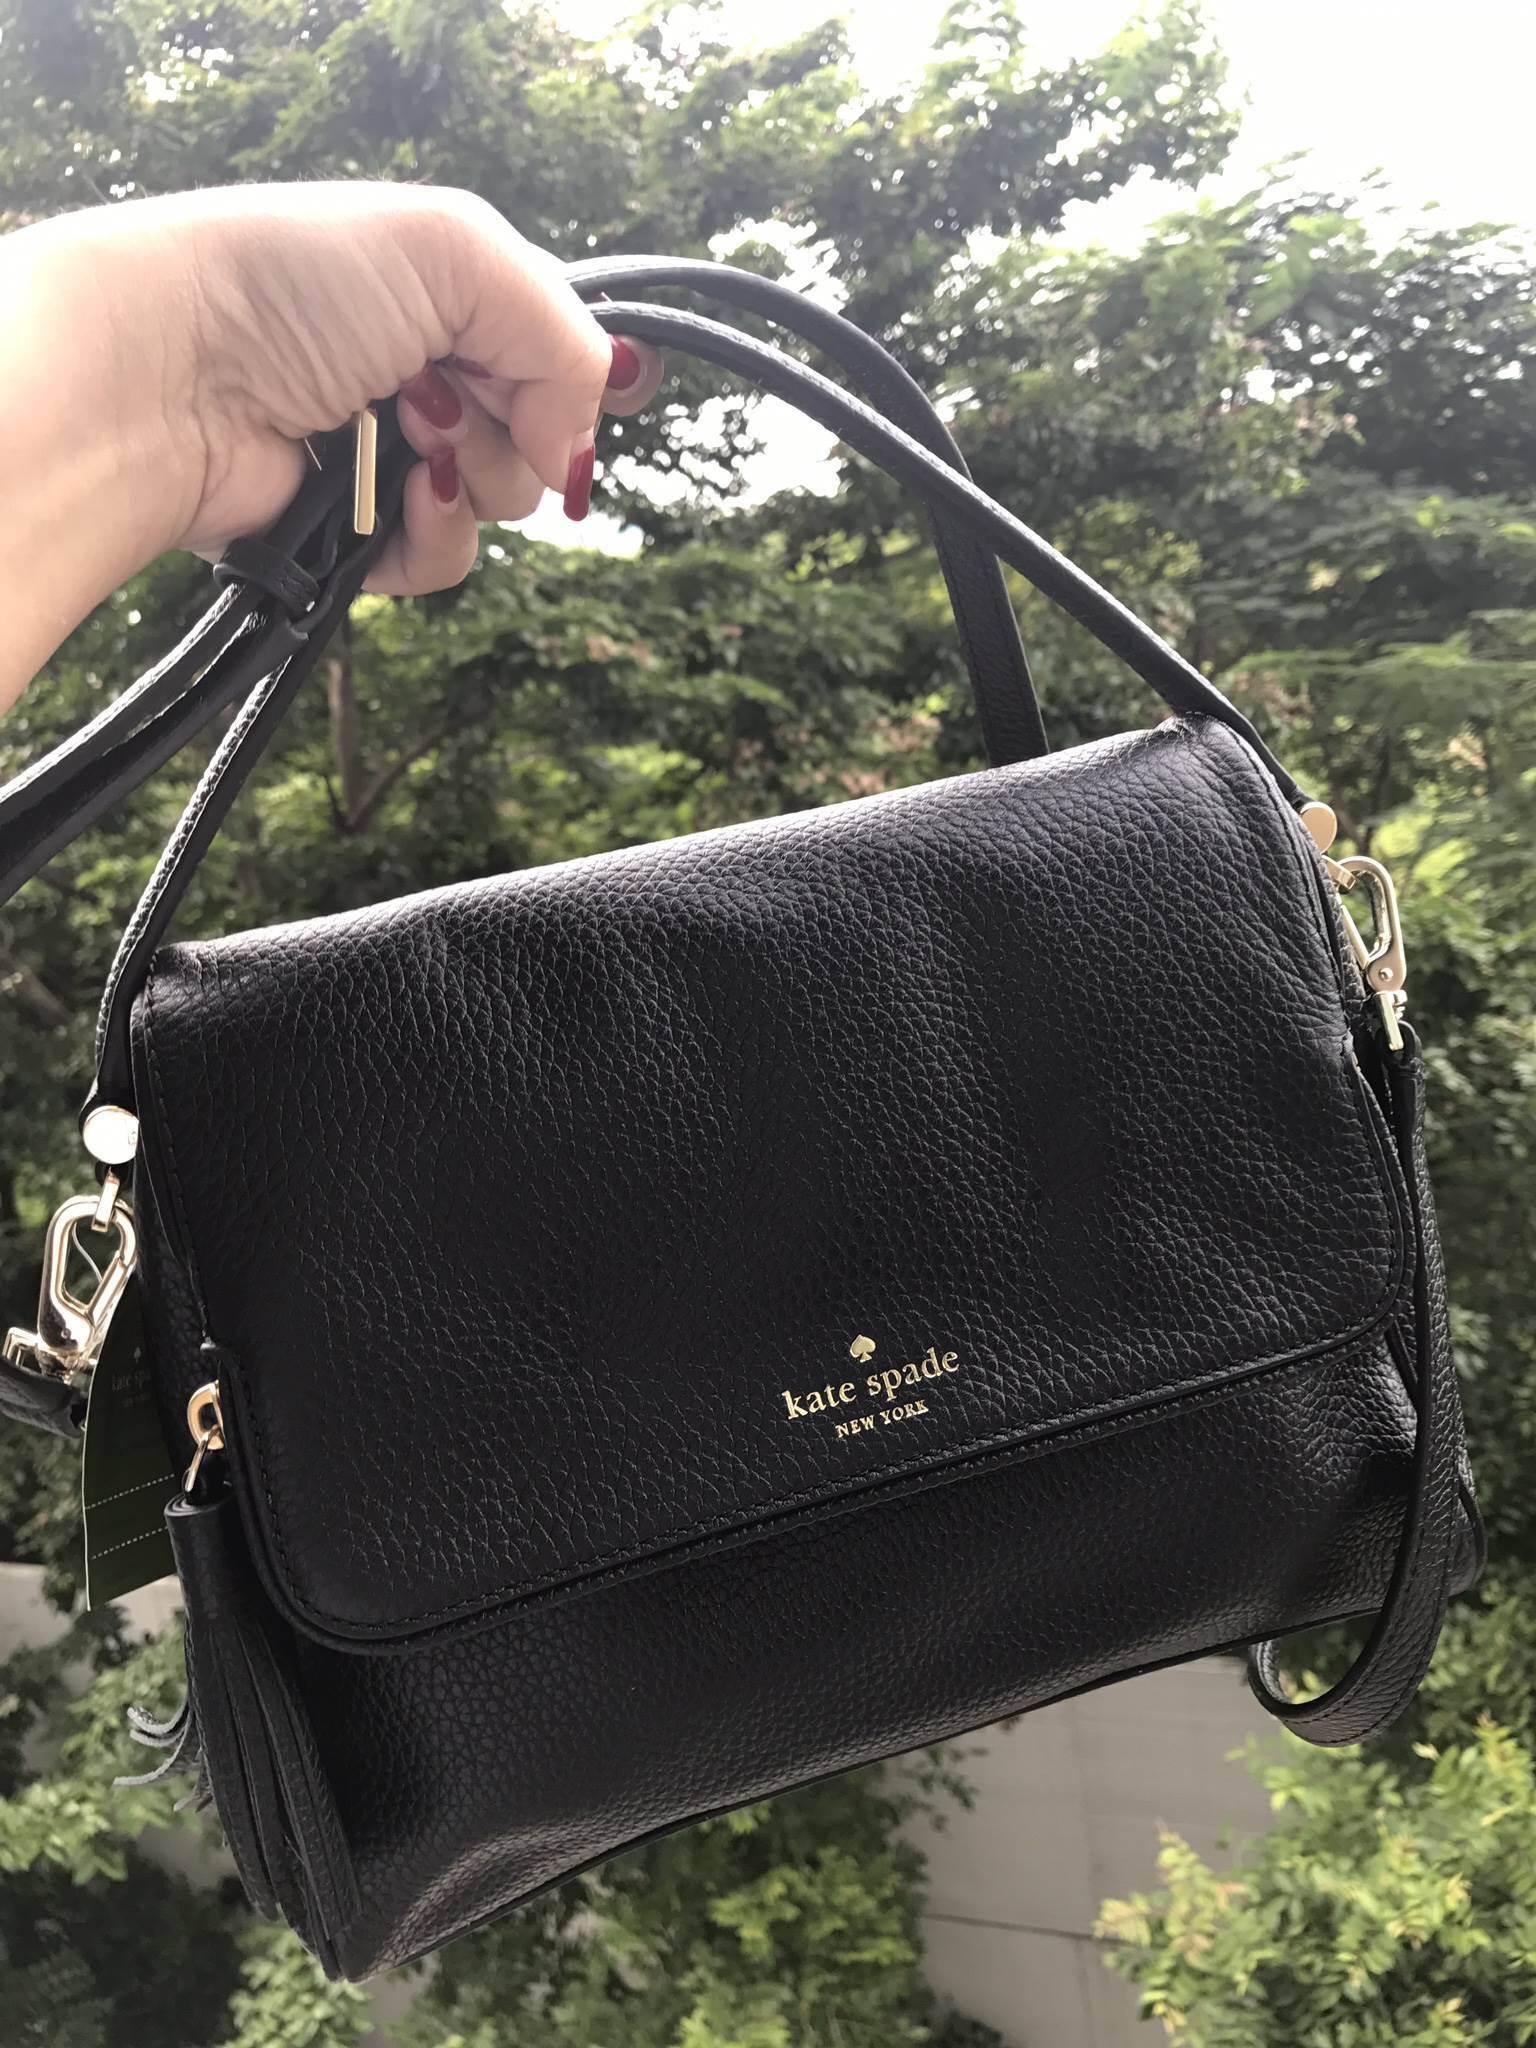 Kate Spade Miri Chester Street Leather Satchel - Black #Katespadeแท้